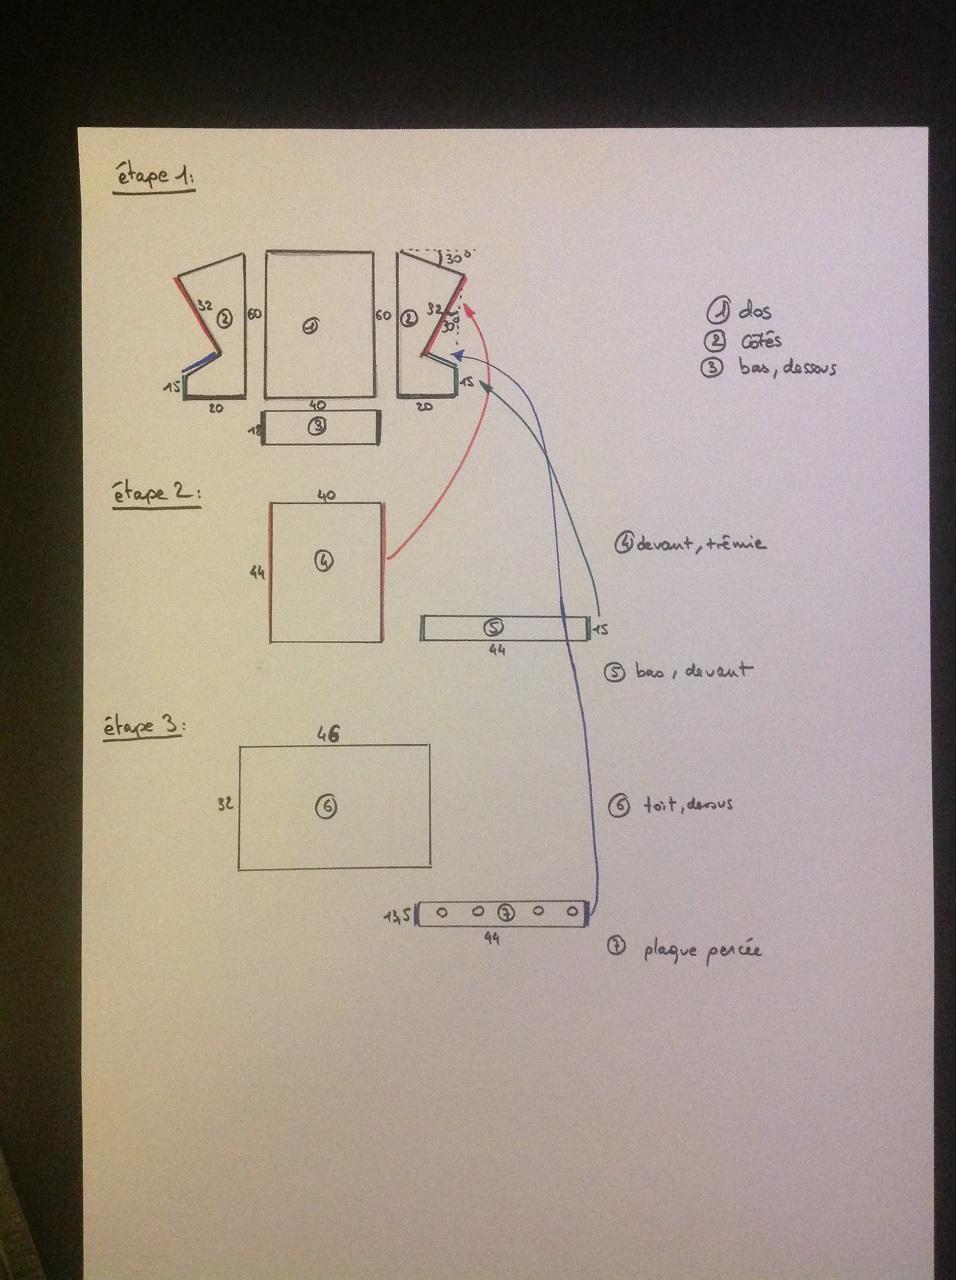 fabrication d 39 une mangeoire anti gaspillage pour poules slydventure. Black Bedroom Furniture Sets. Home Design Ideas